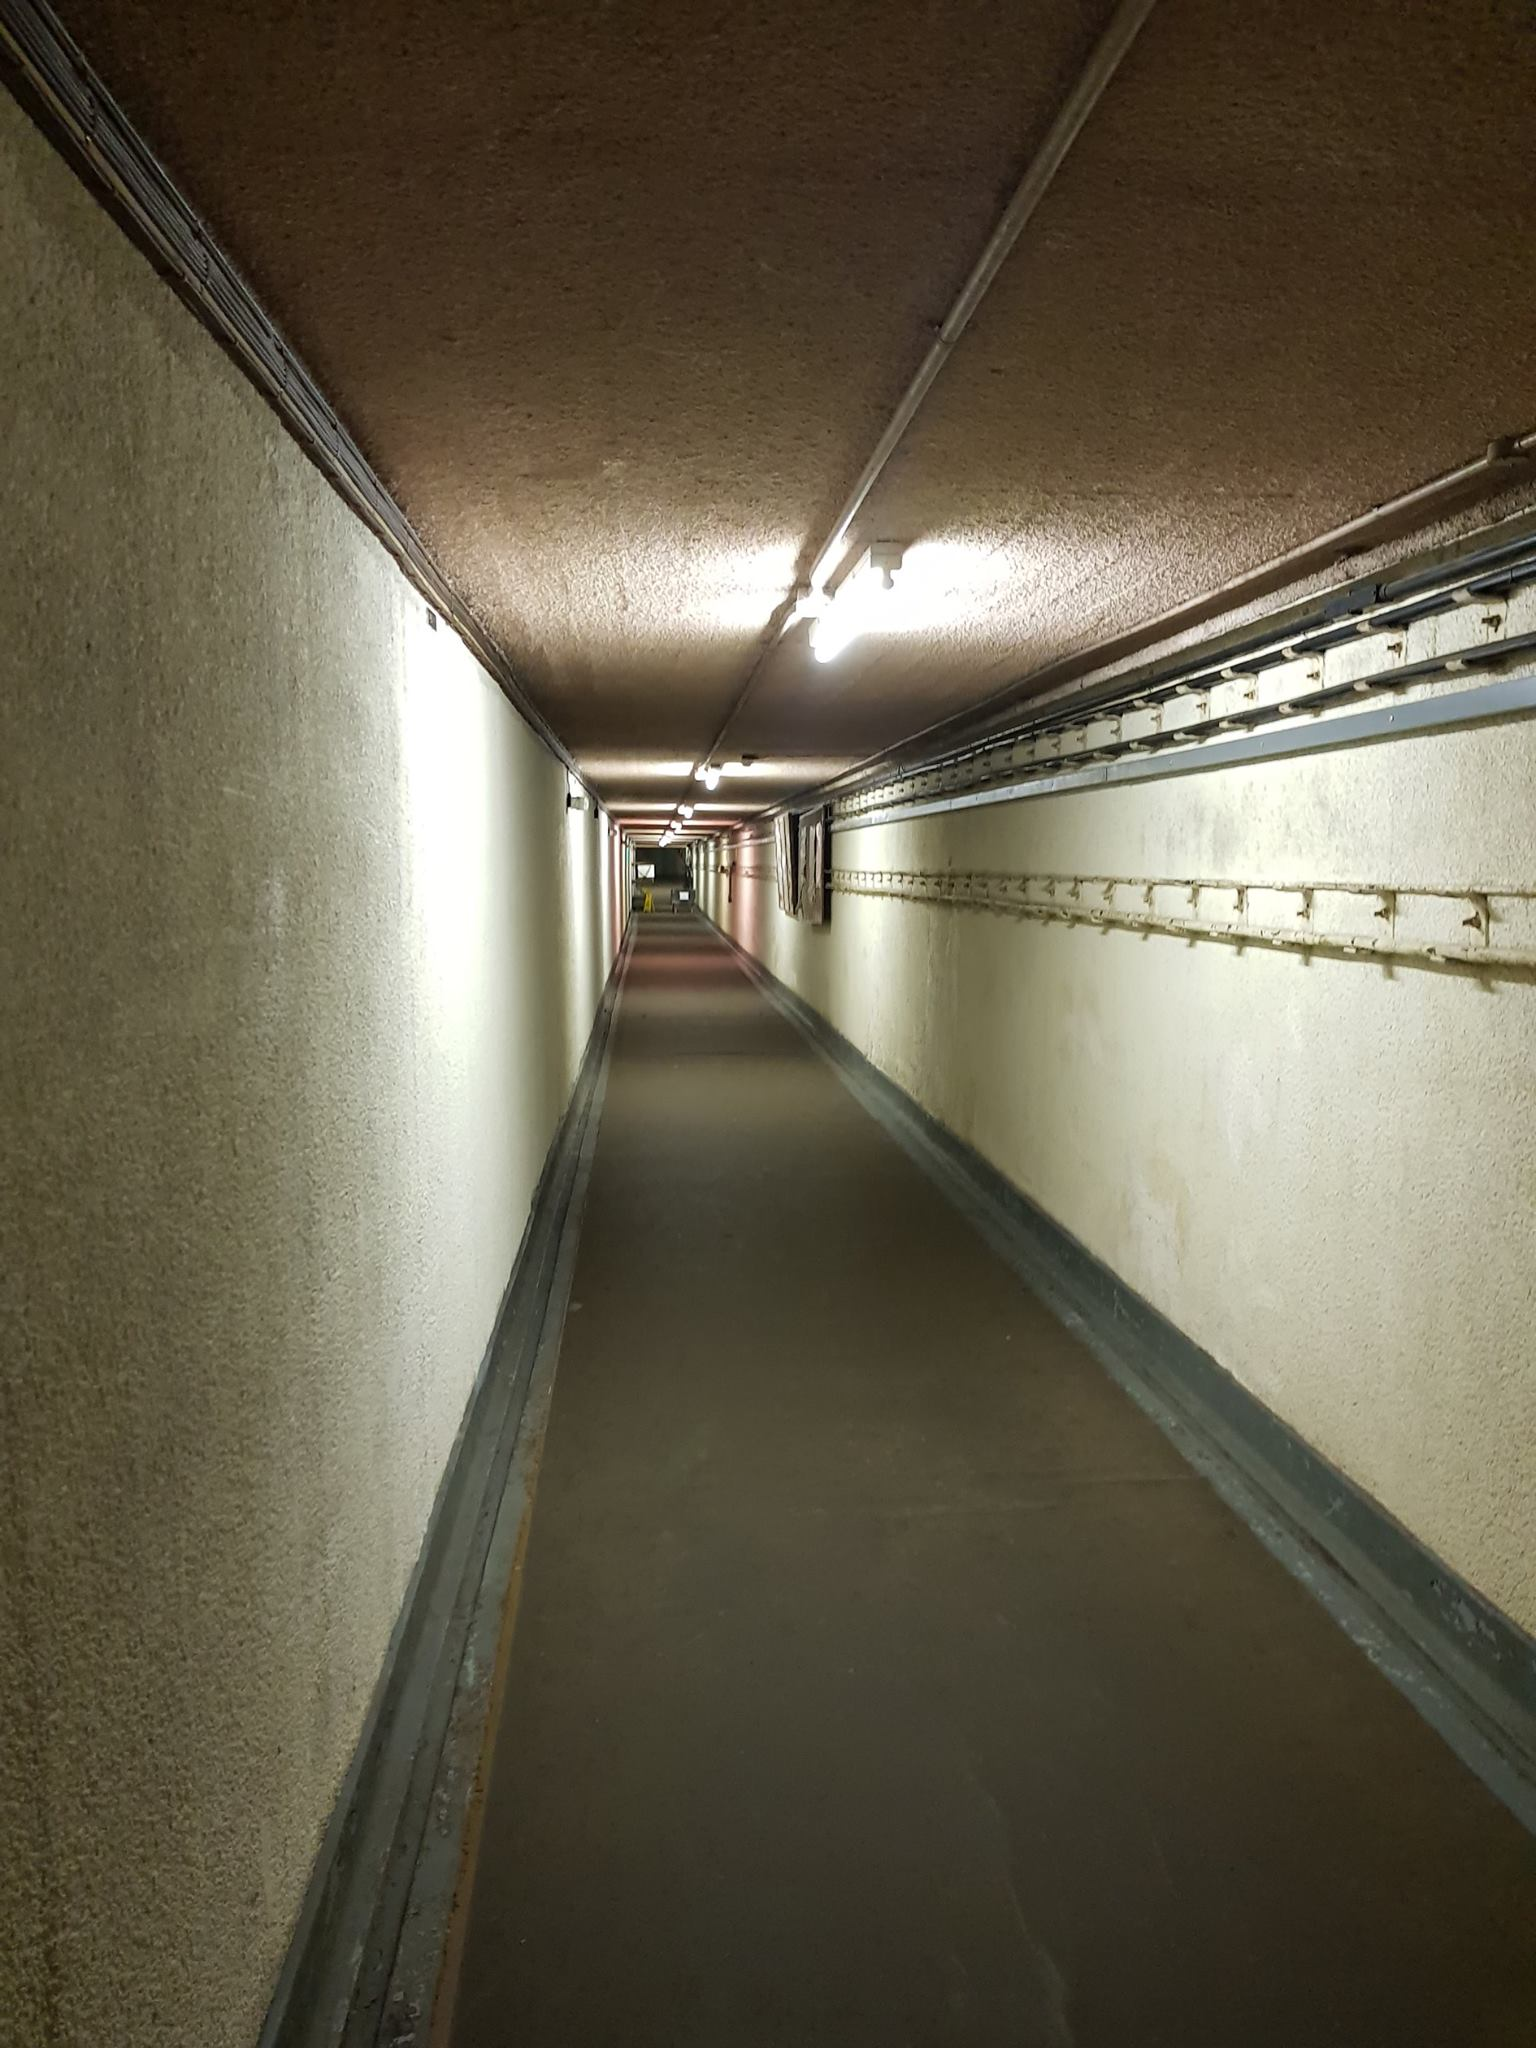 Kelvdon Hatch Bunker 4